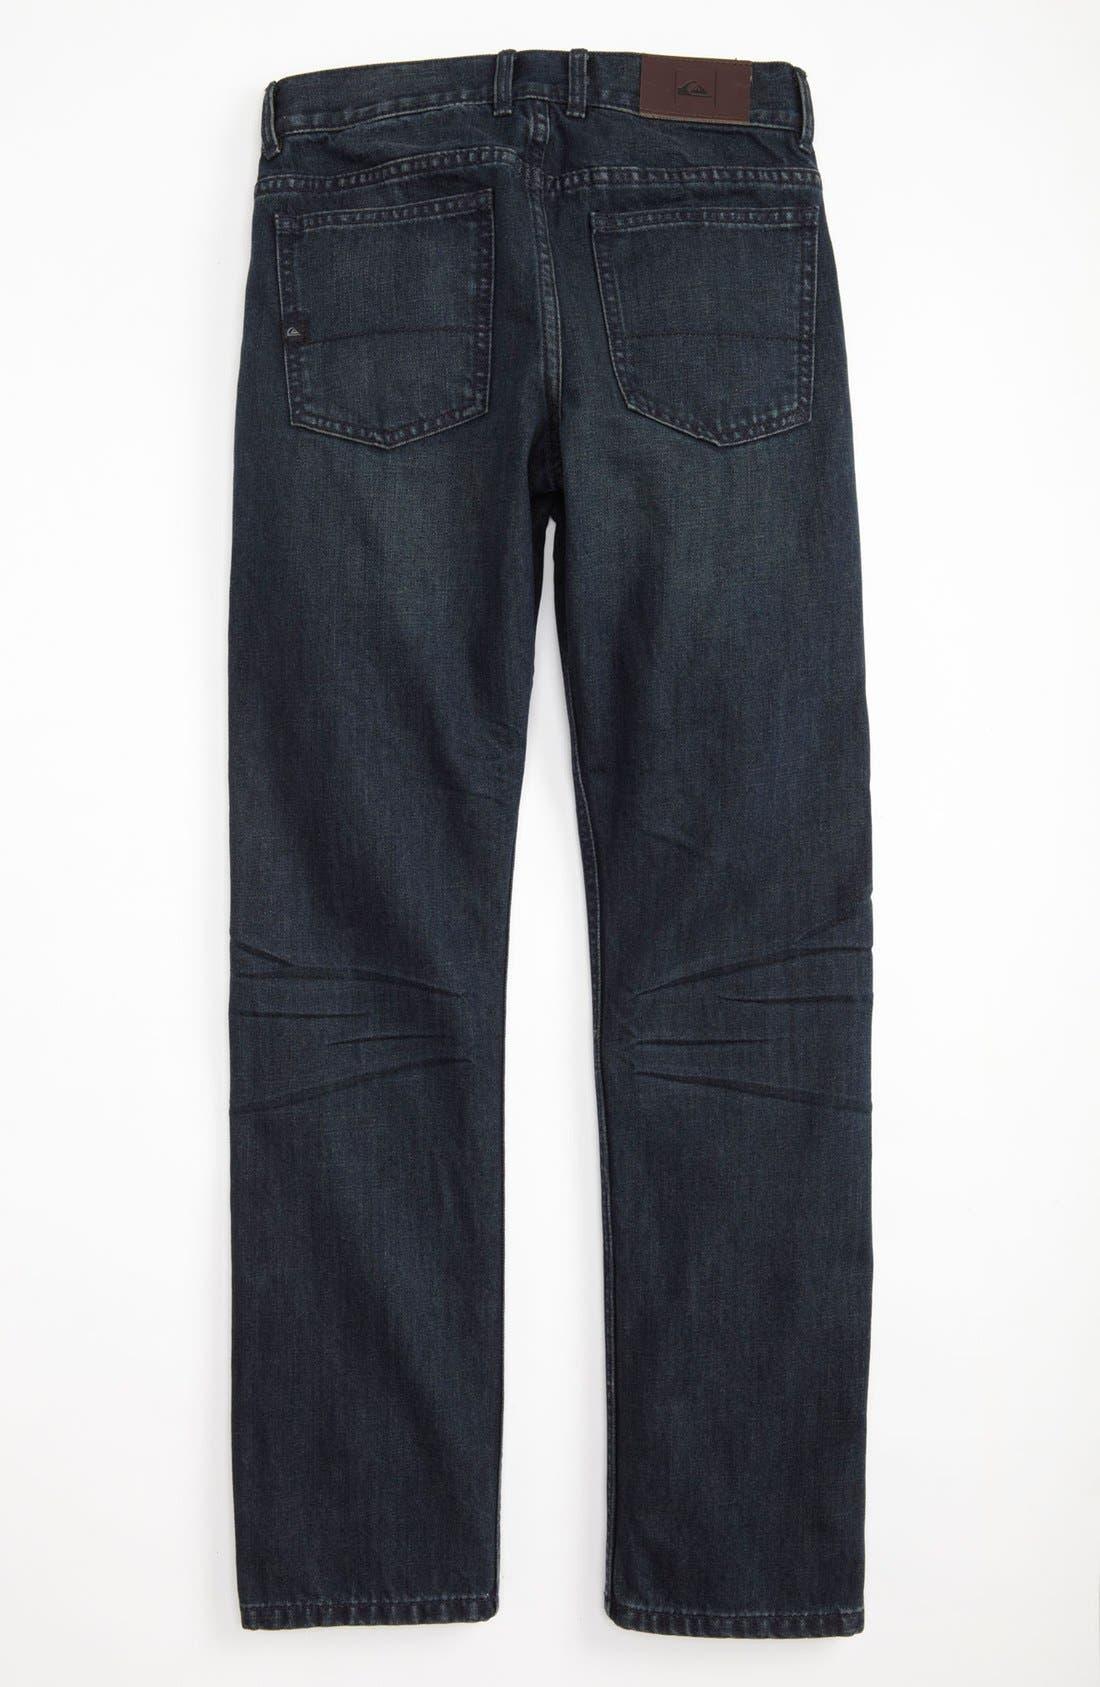 Alternate Image 1 Selected - Quiksilver 'Distortion' Slim Straight Leg Jeans (Big Boys)